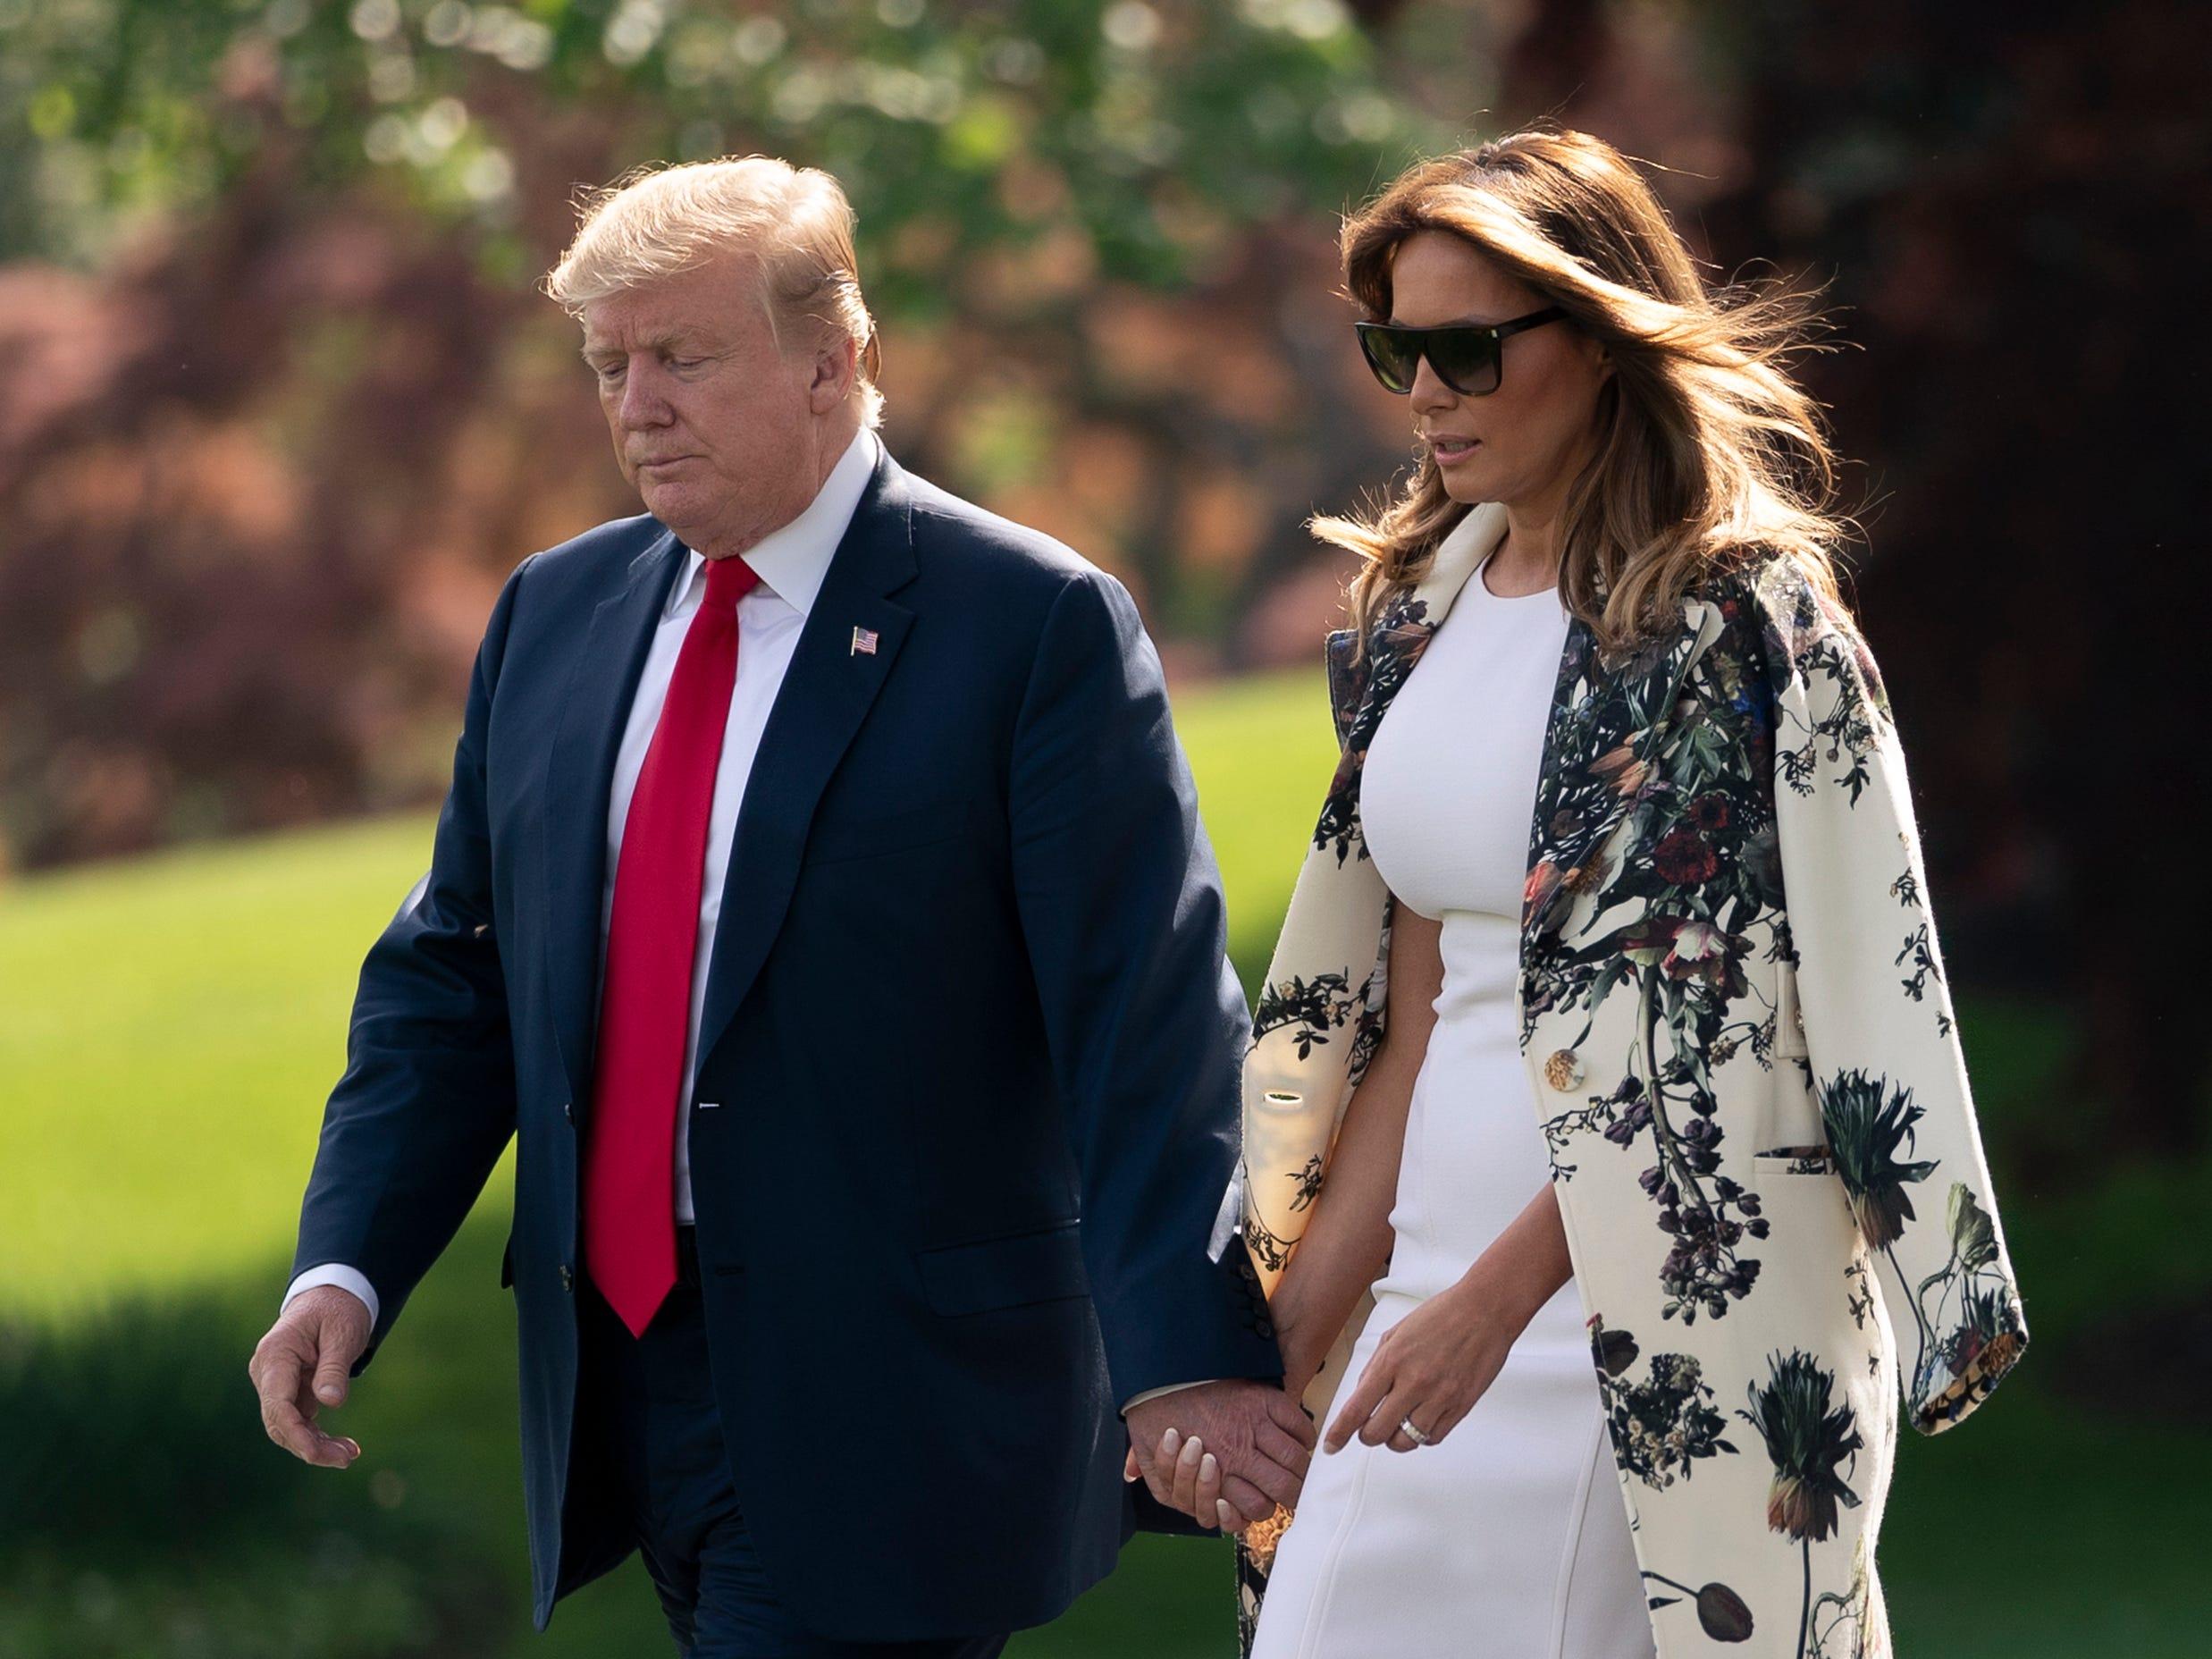 Mueller report: A corrupt, unpatriotic president, a stark impeachment choice for Democrats